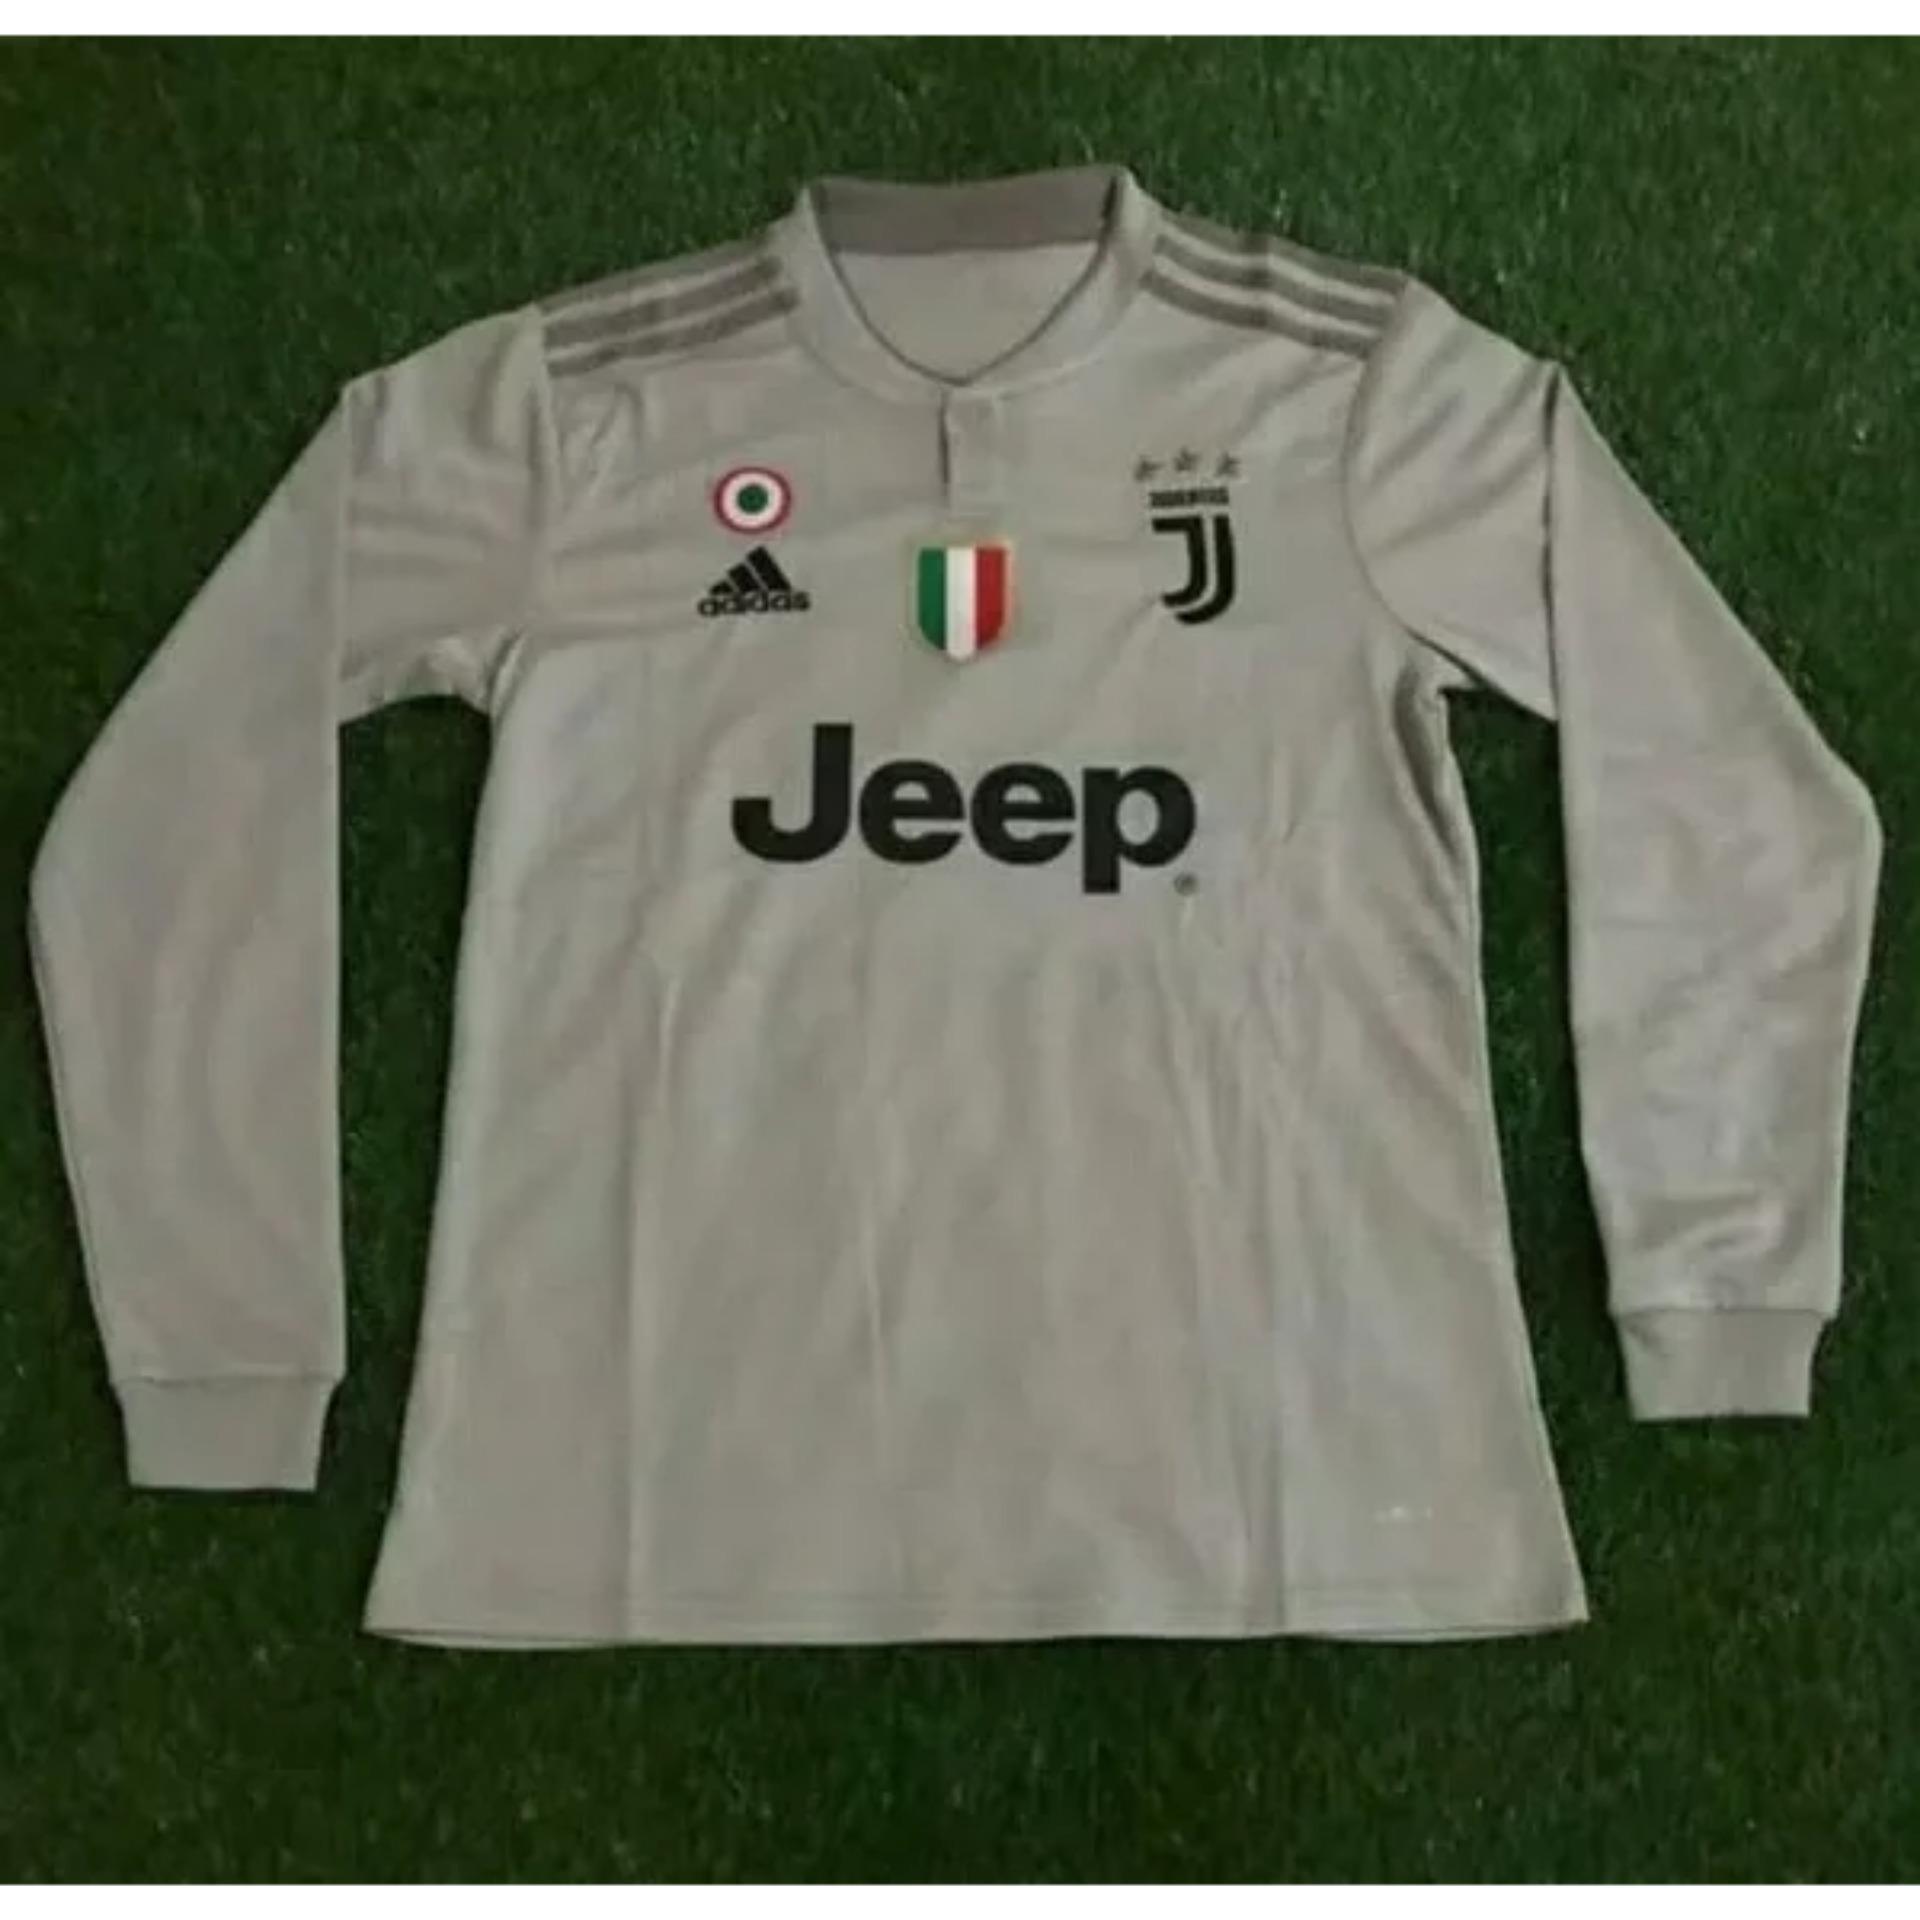 Lihat Harga Sepatu Futsal Juventus Paling Baru Bhinekashop Kaos Baju Bola Juve New Logo 2017 Ddz Fashion Jersey Olahraga T Shirt Football Murah Lengan Panjang